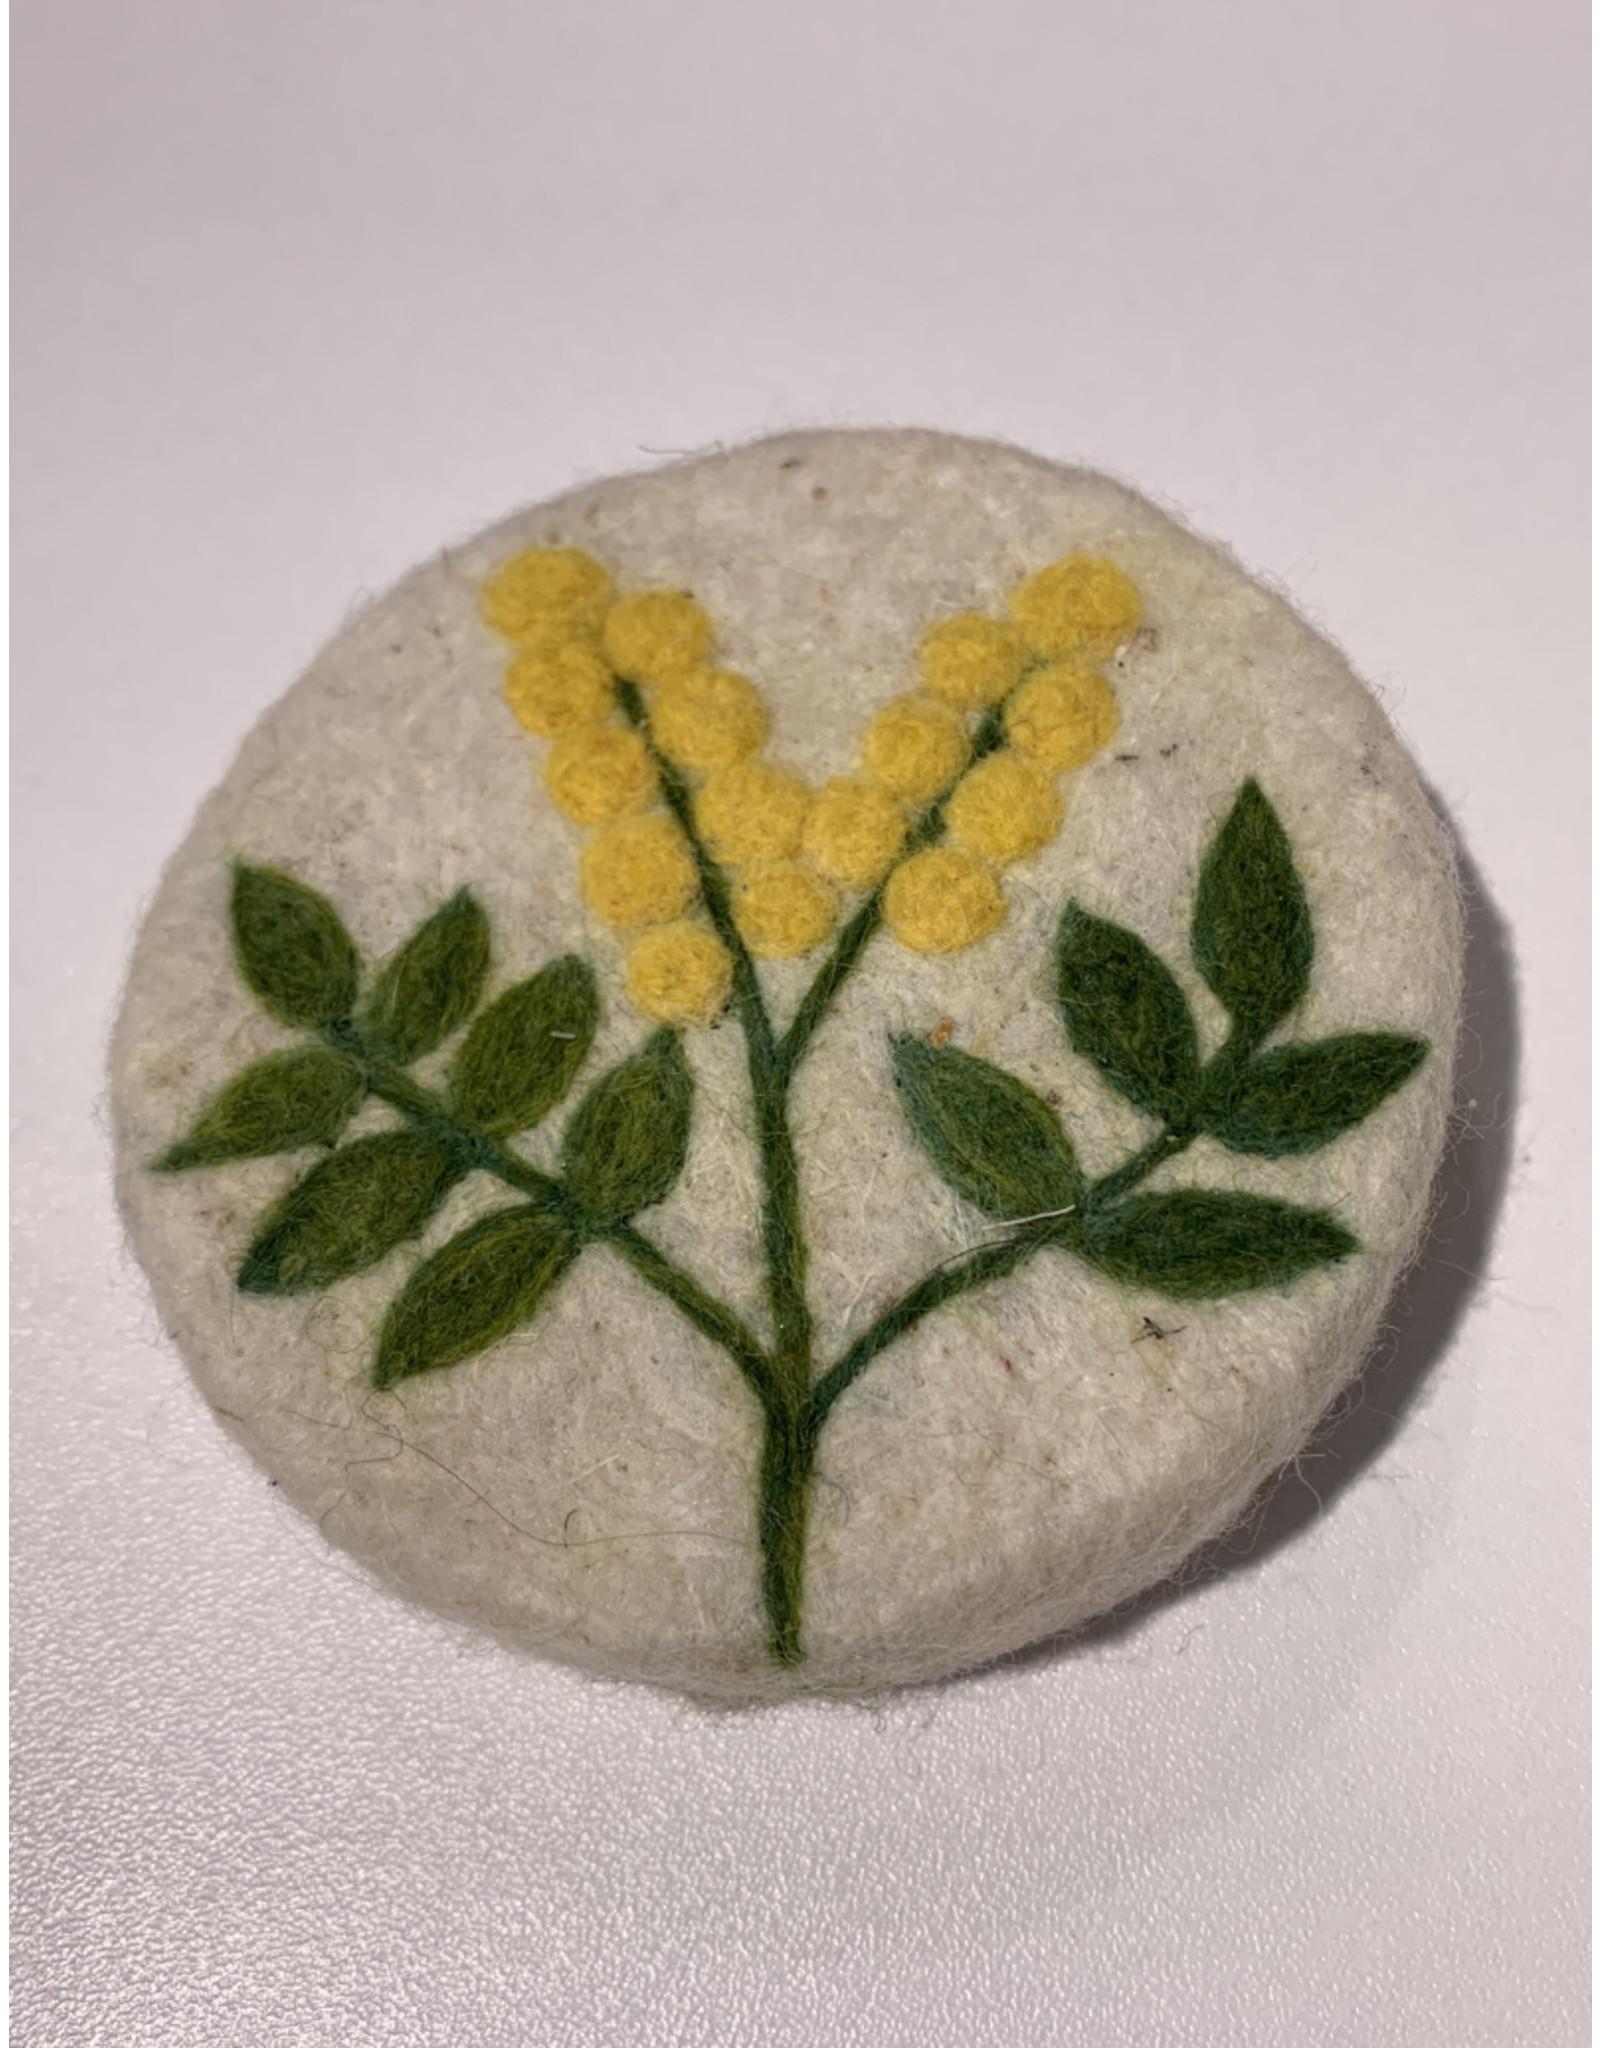 Filzseife gelbe Äre 100% Wollfilz Handmade